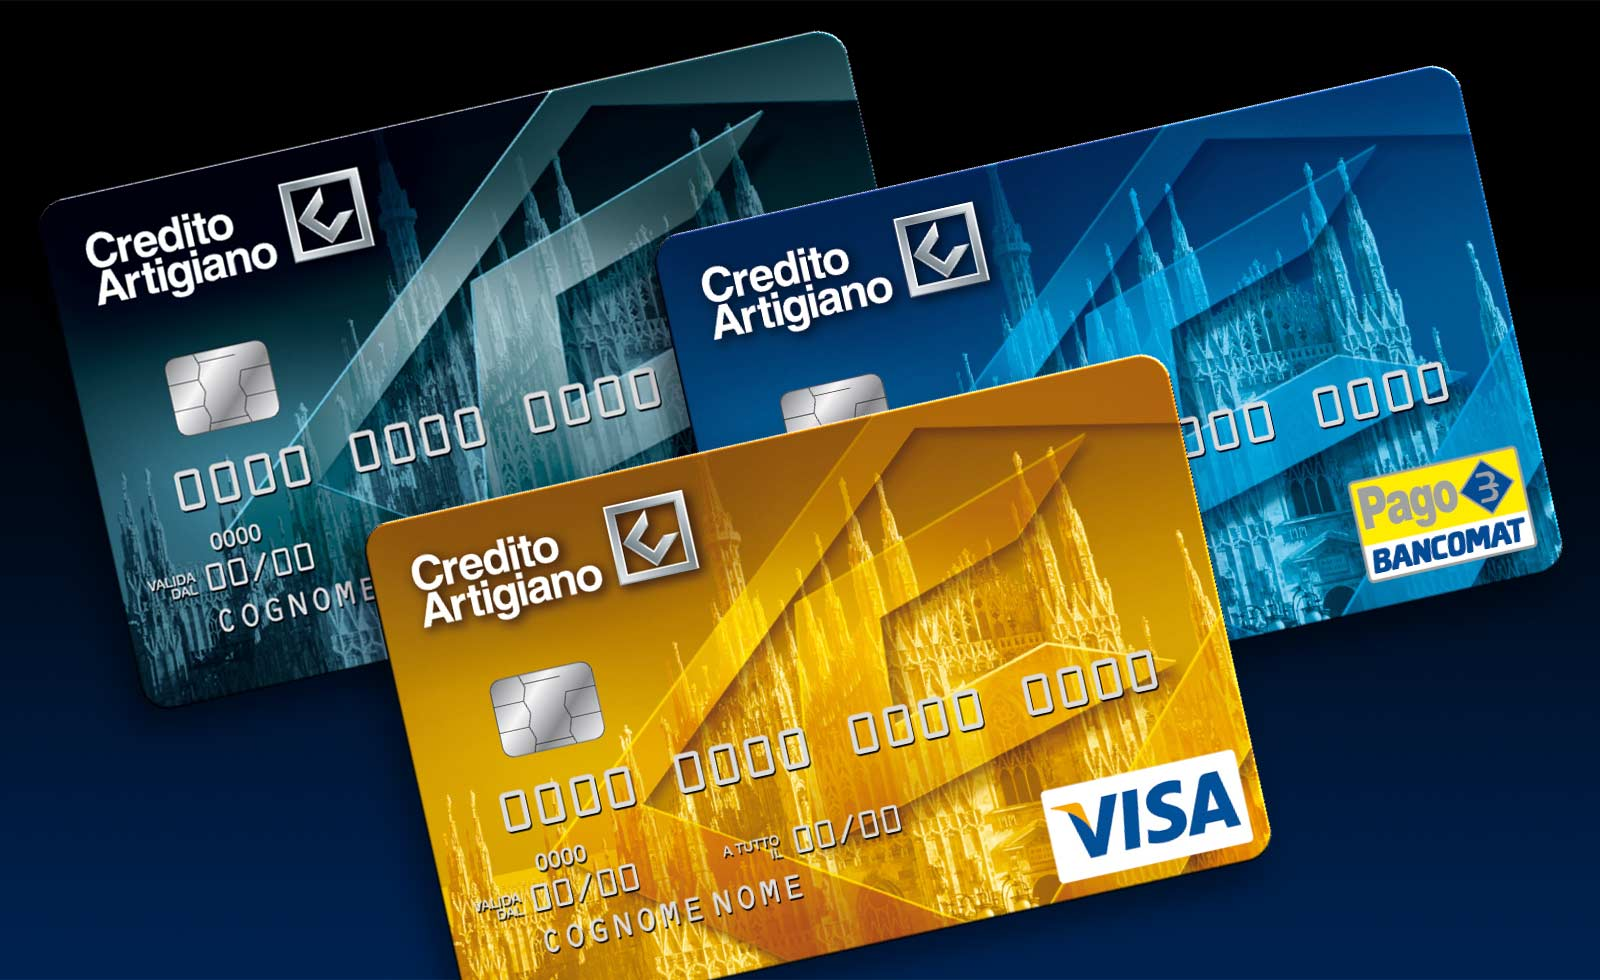 creval crediti card bancomat pitscheider